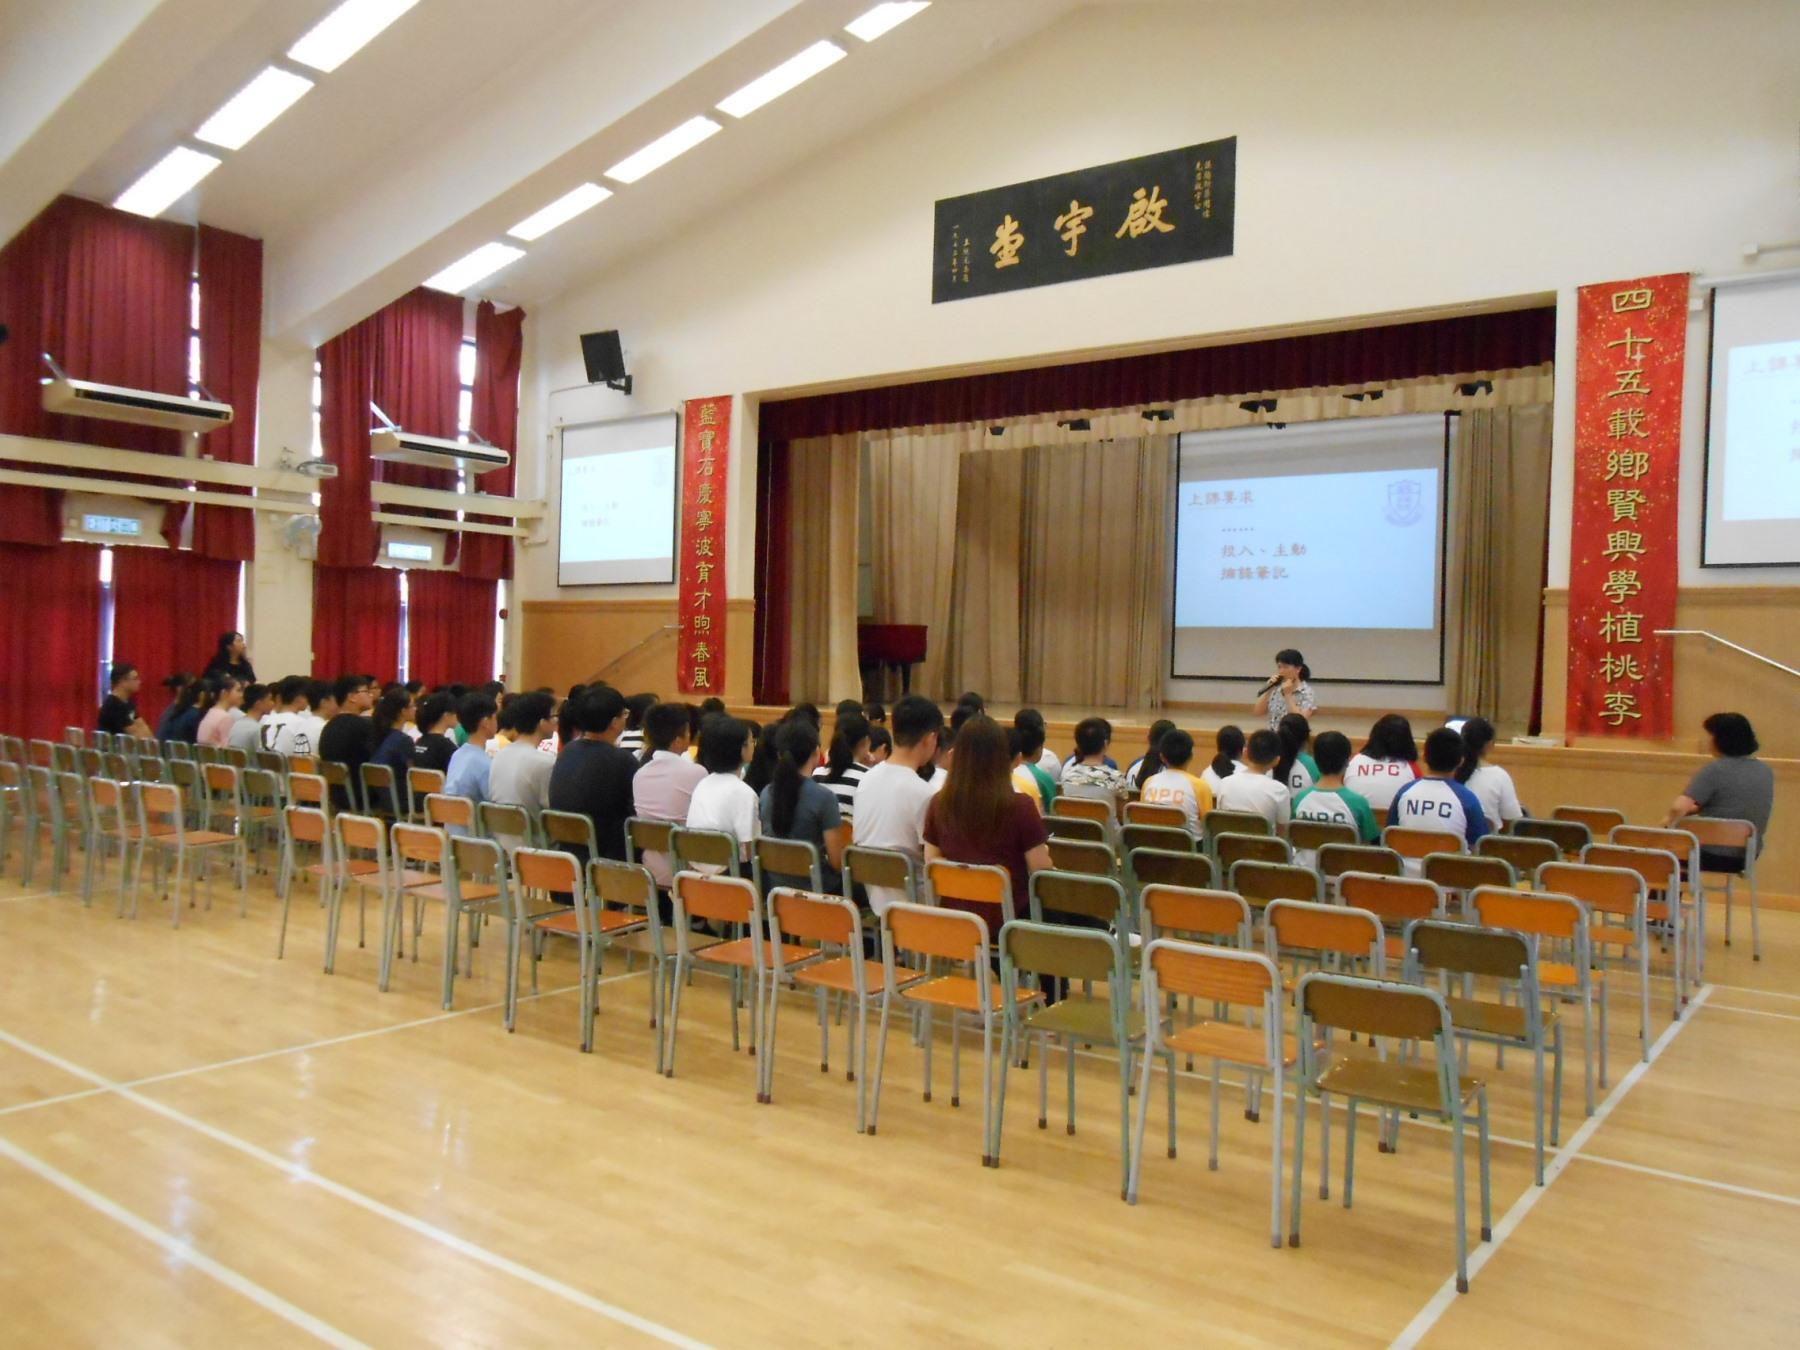 http://npc.edu.hk/sites/default/files/dscn9617.jpg